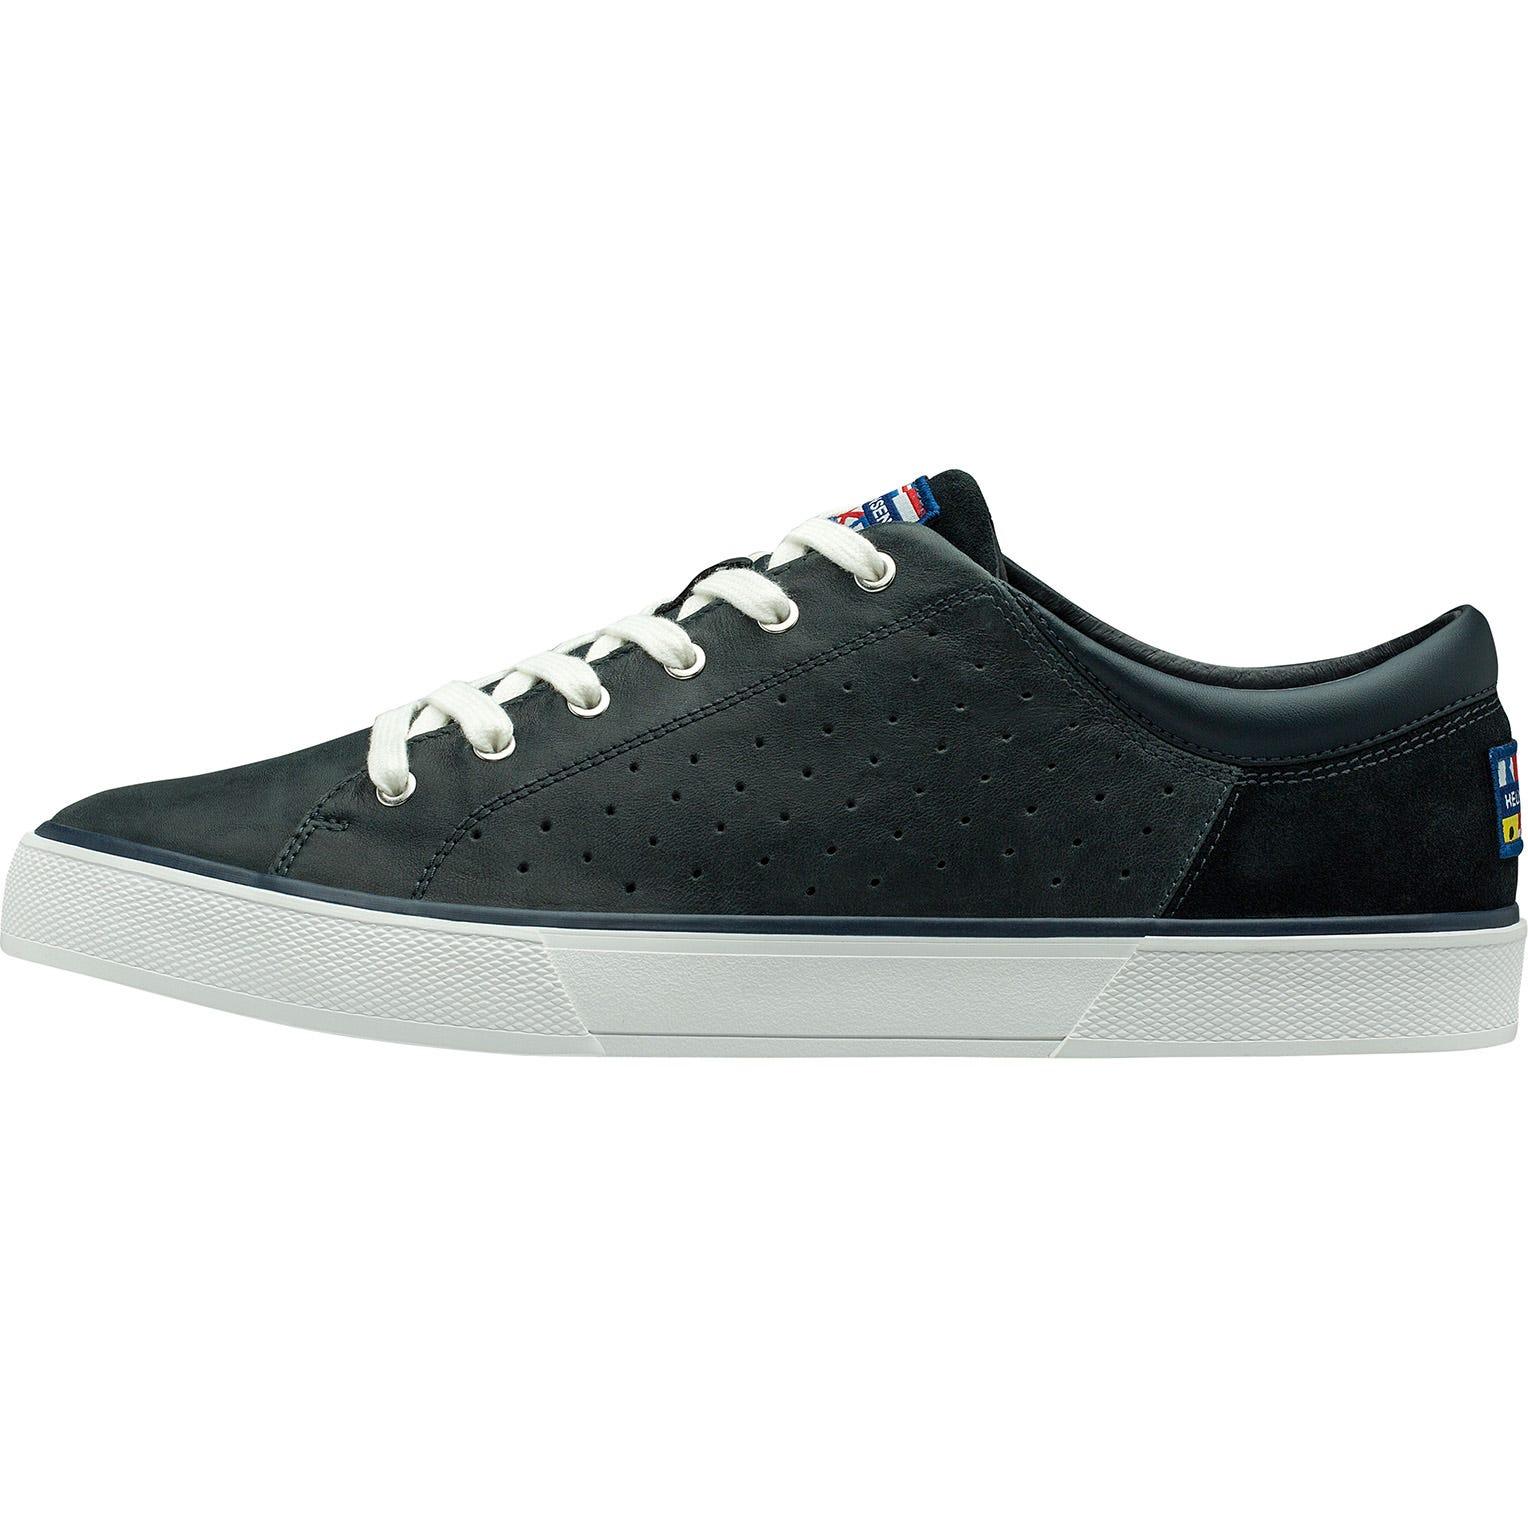 Helly Hansen Copenhagen Leather Shoe Mens Casual Navy 46.5/12